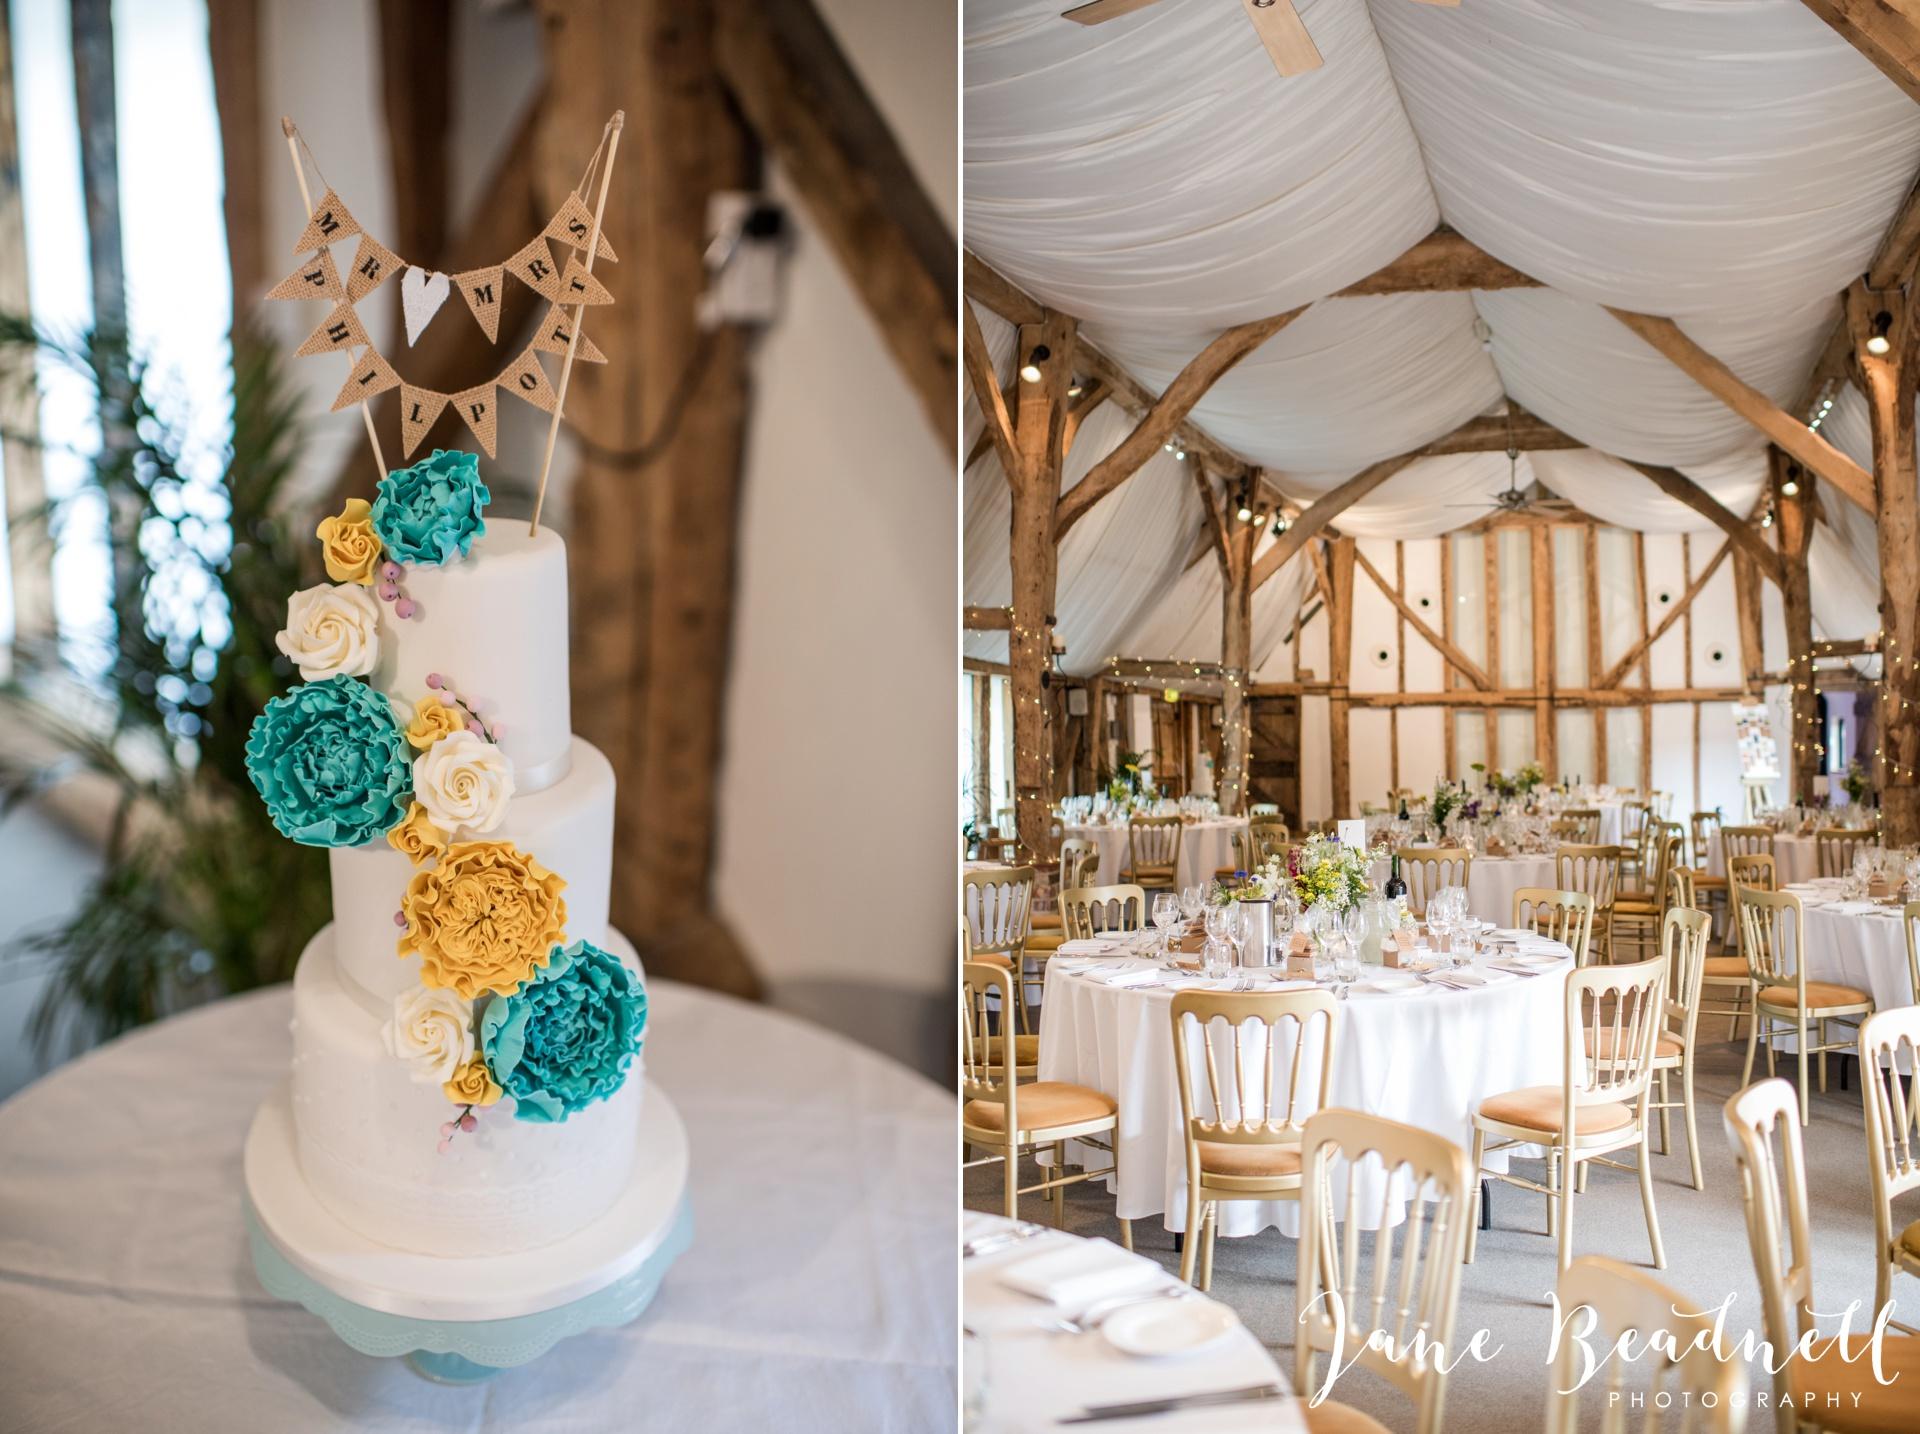 South Farm Wedding photography Hertfordshire by Jane Beadnell Photography fine art wedding photographer_0159